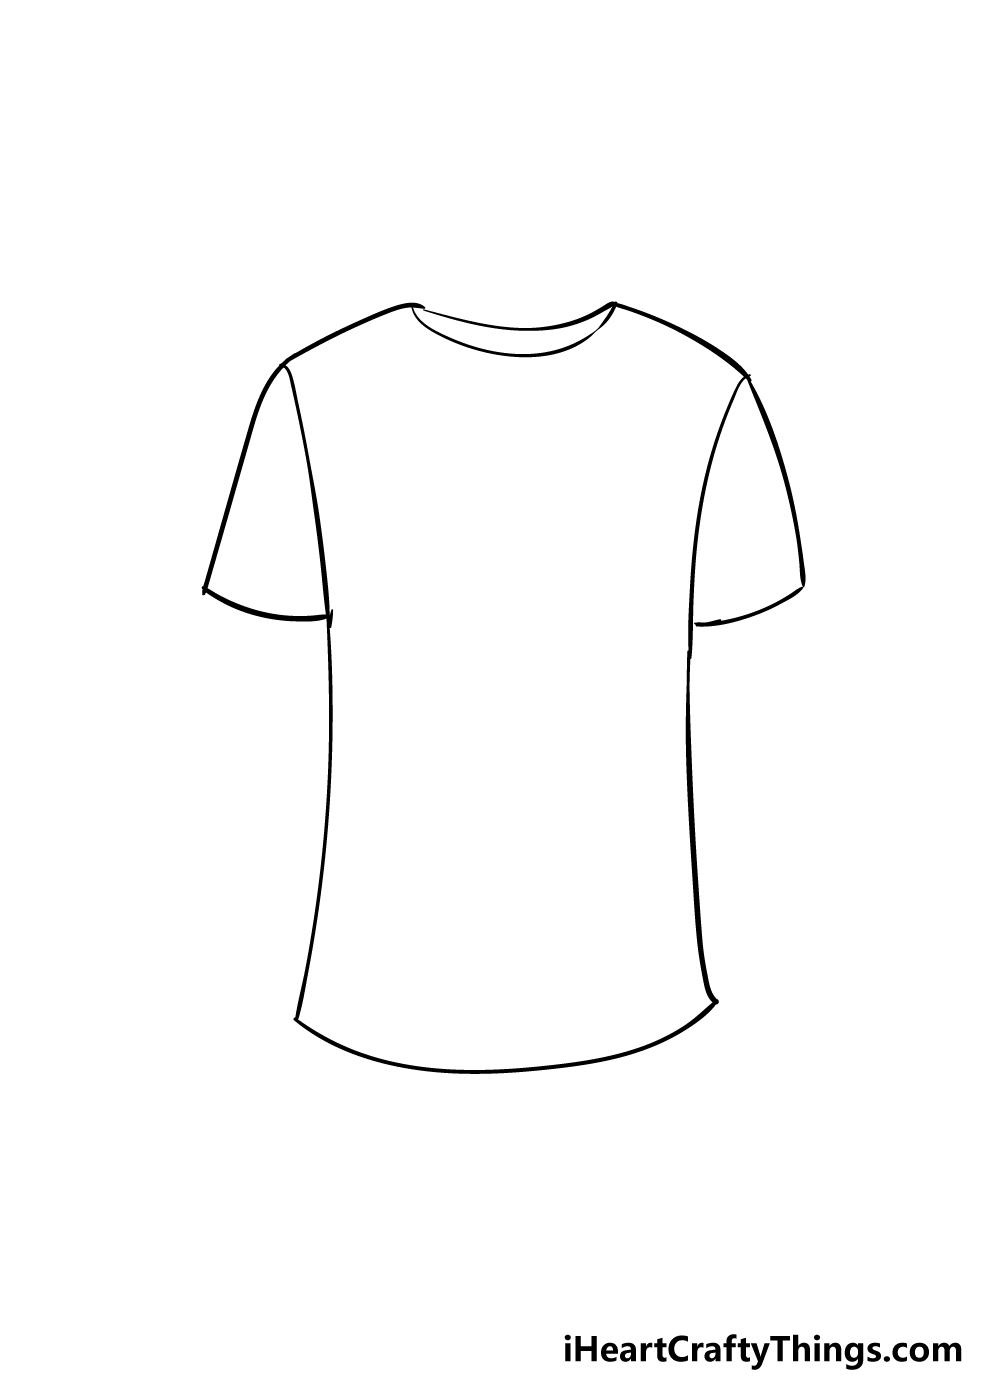 shirt drawing step 4